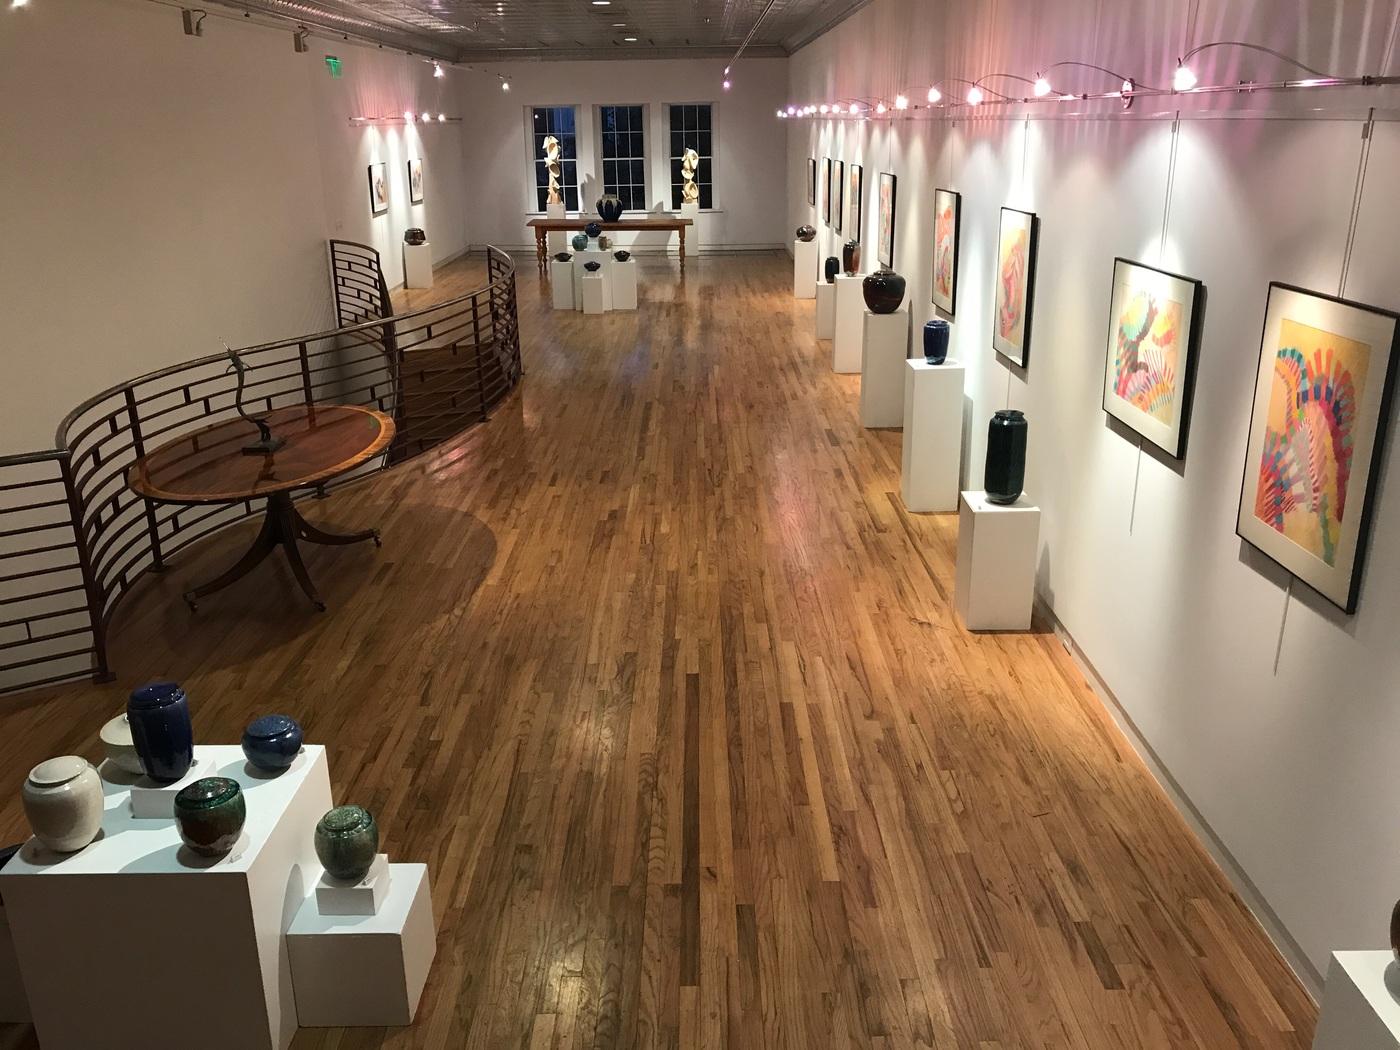 harrison galleries first friday